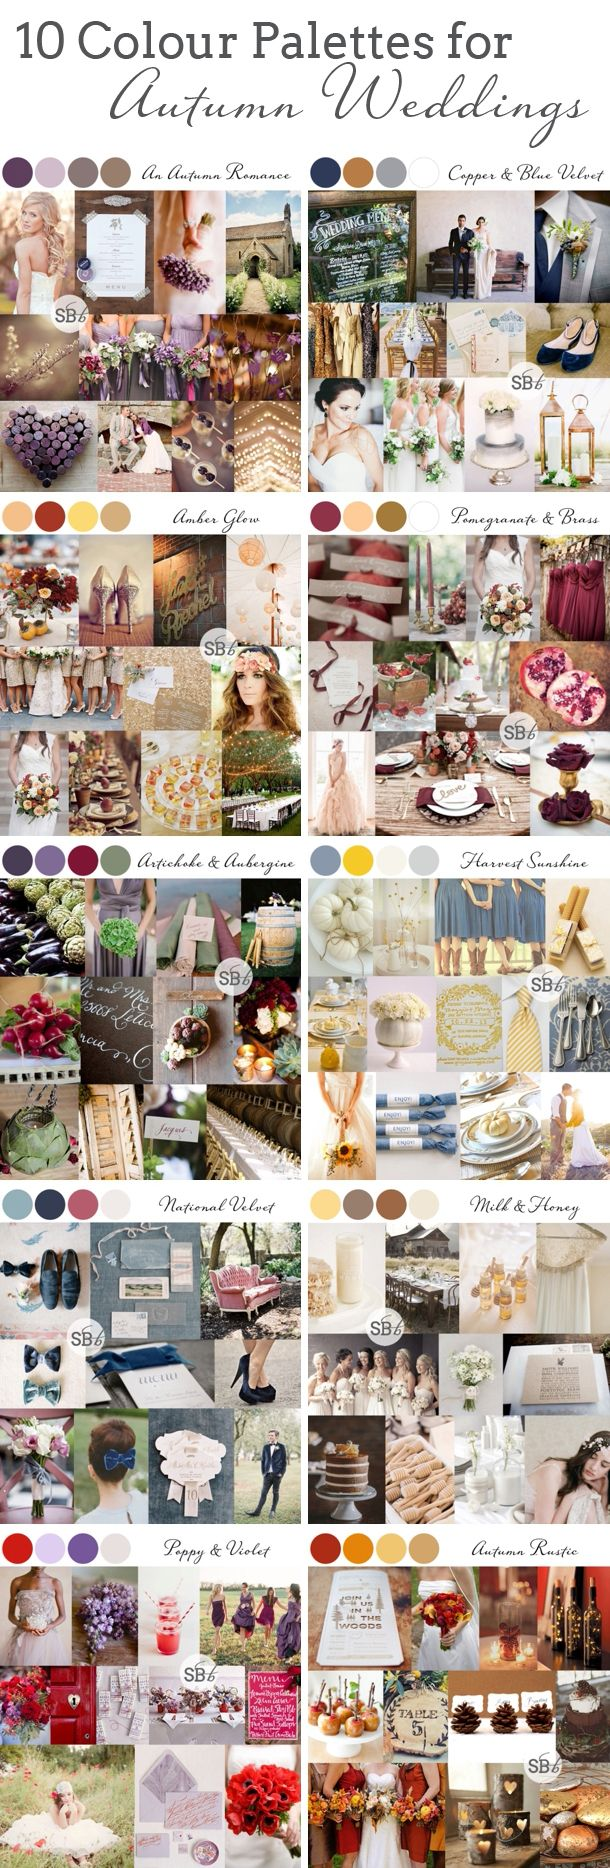 10 Autumn/Fall Colour Palettes | SouthBound Bride | Full credits & links: http://www.southboundbride.com/10-autumn-wedding-colour-palettes